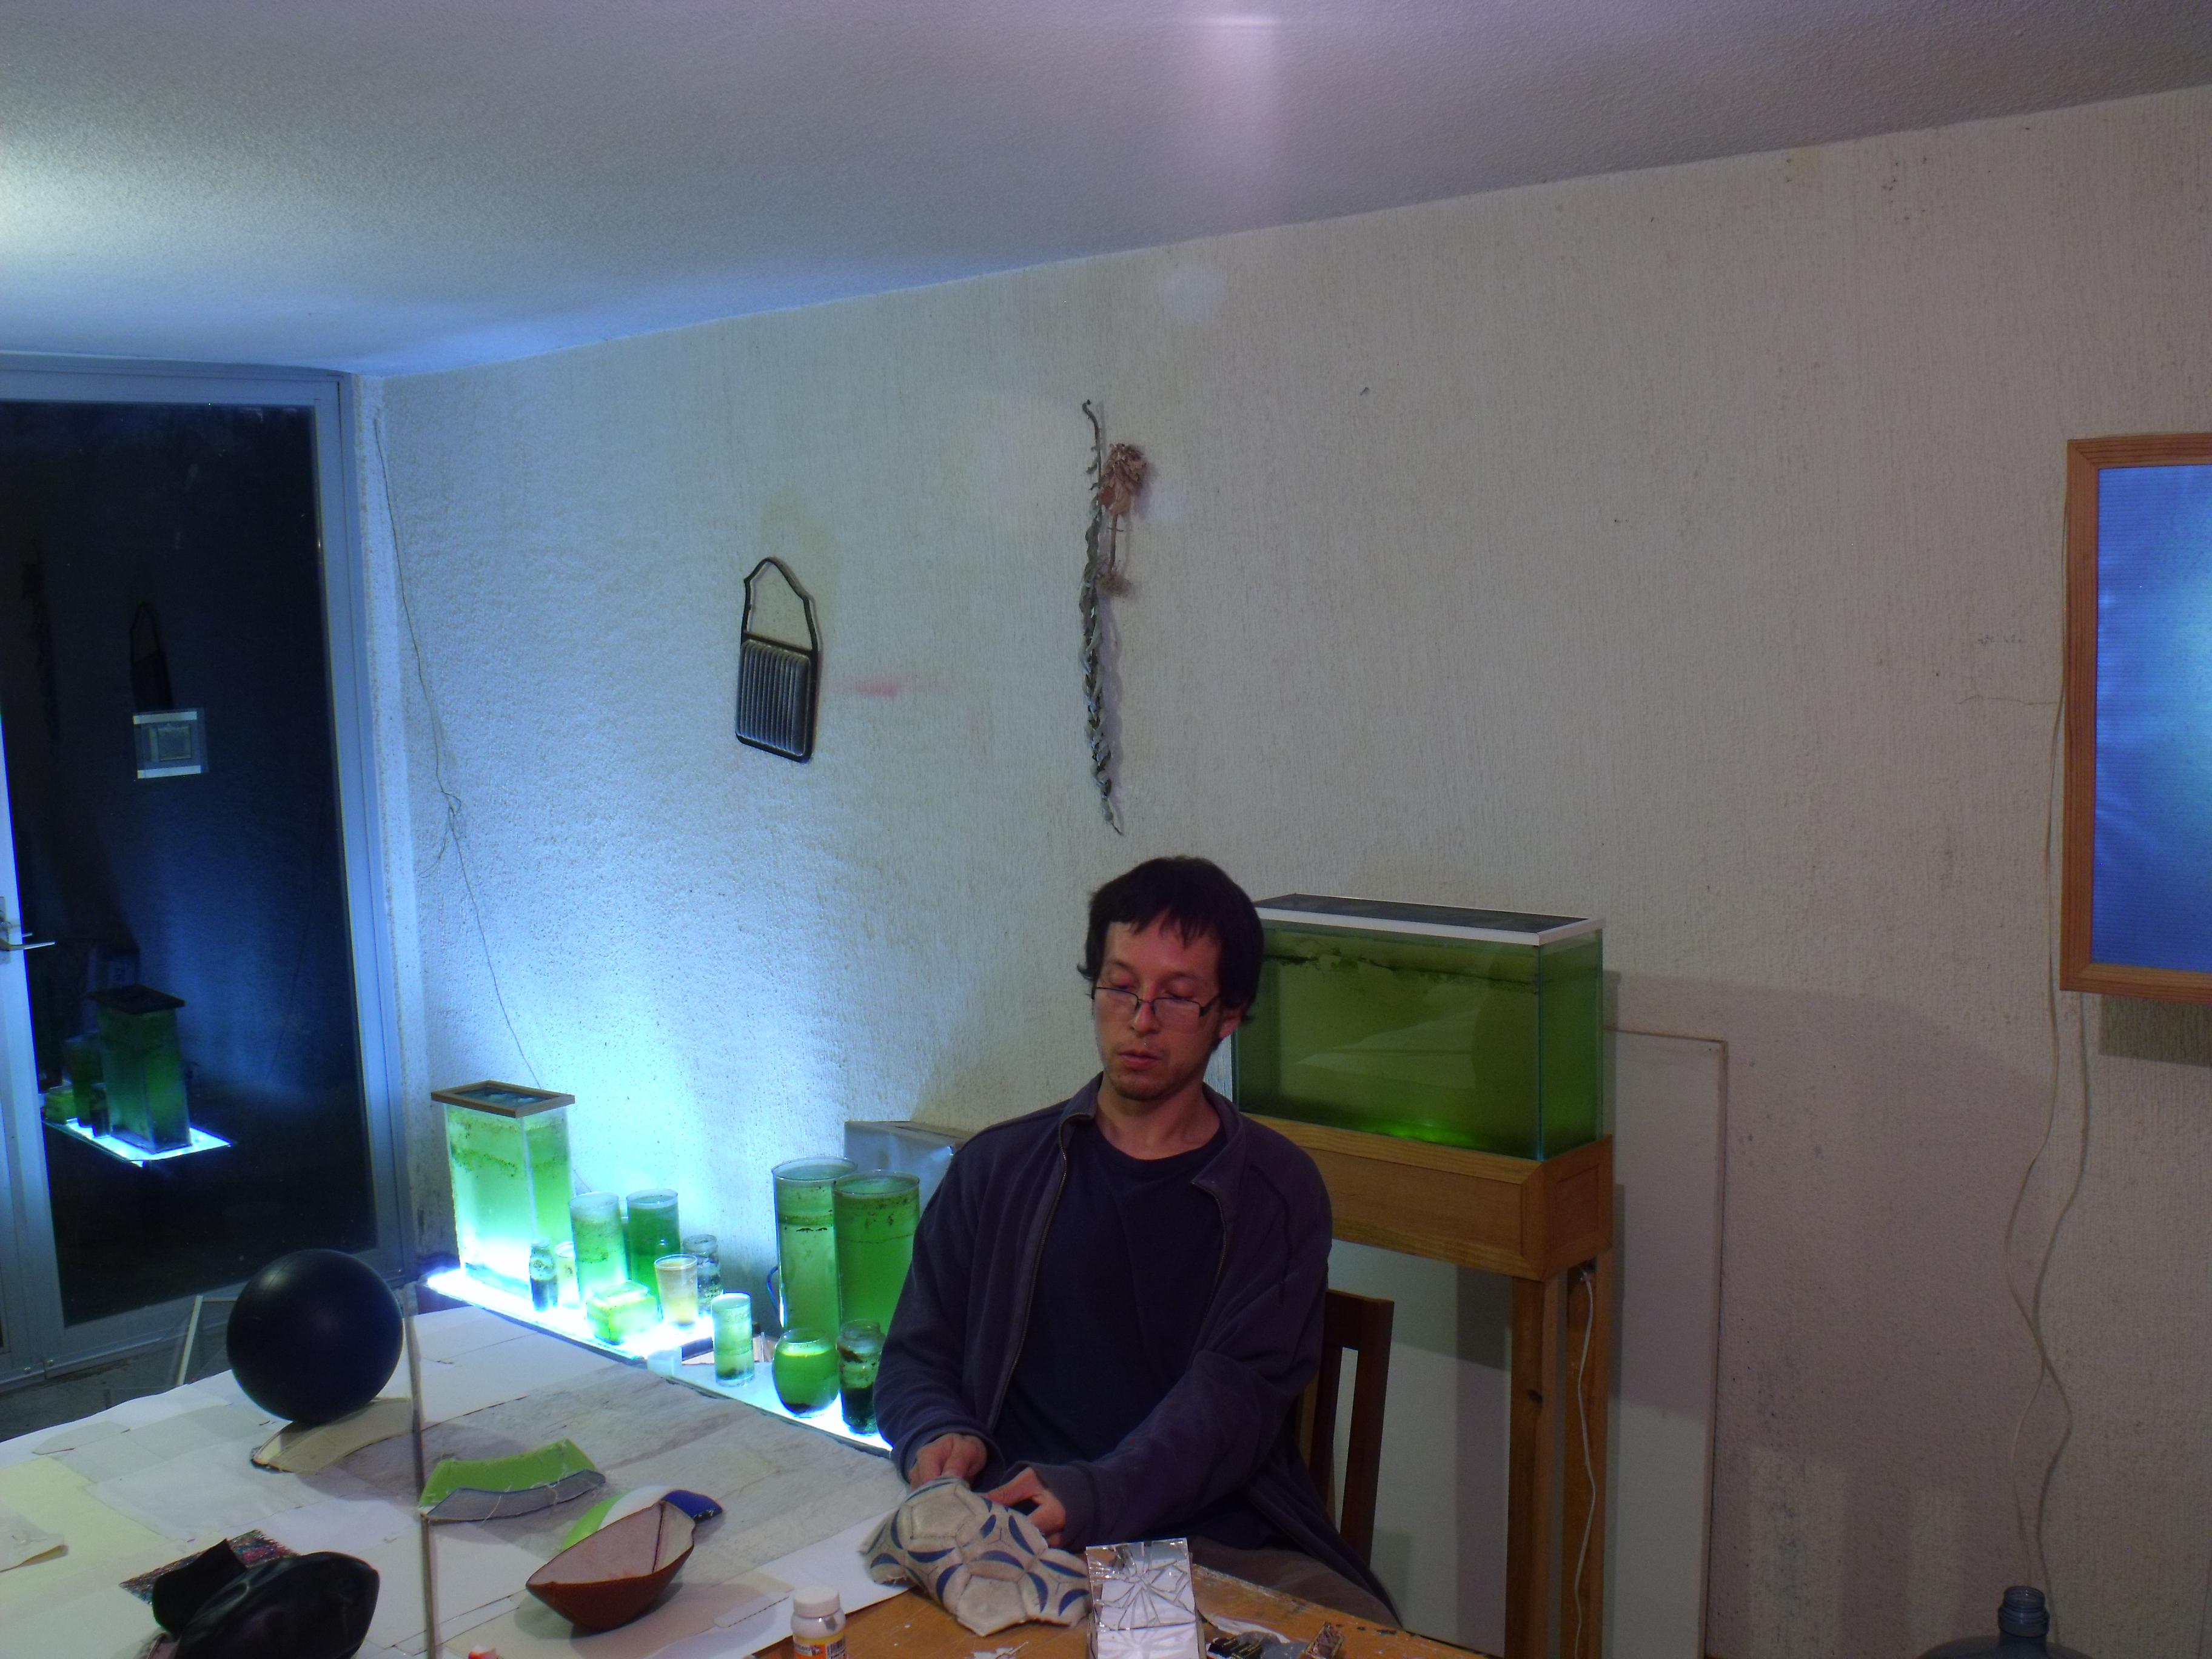 Luis Hilario Tovar Bonilla